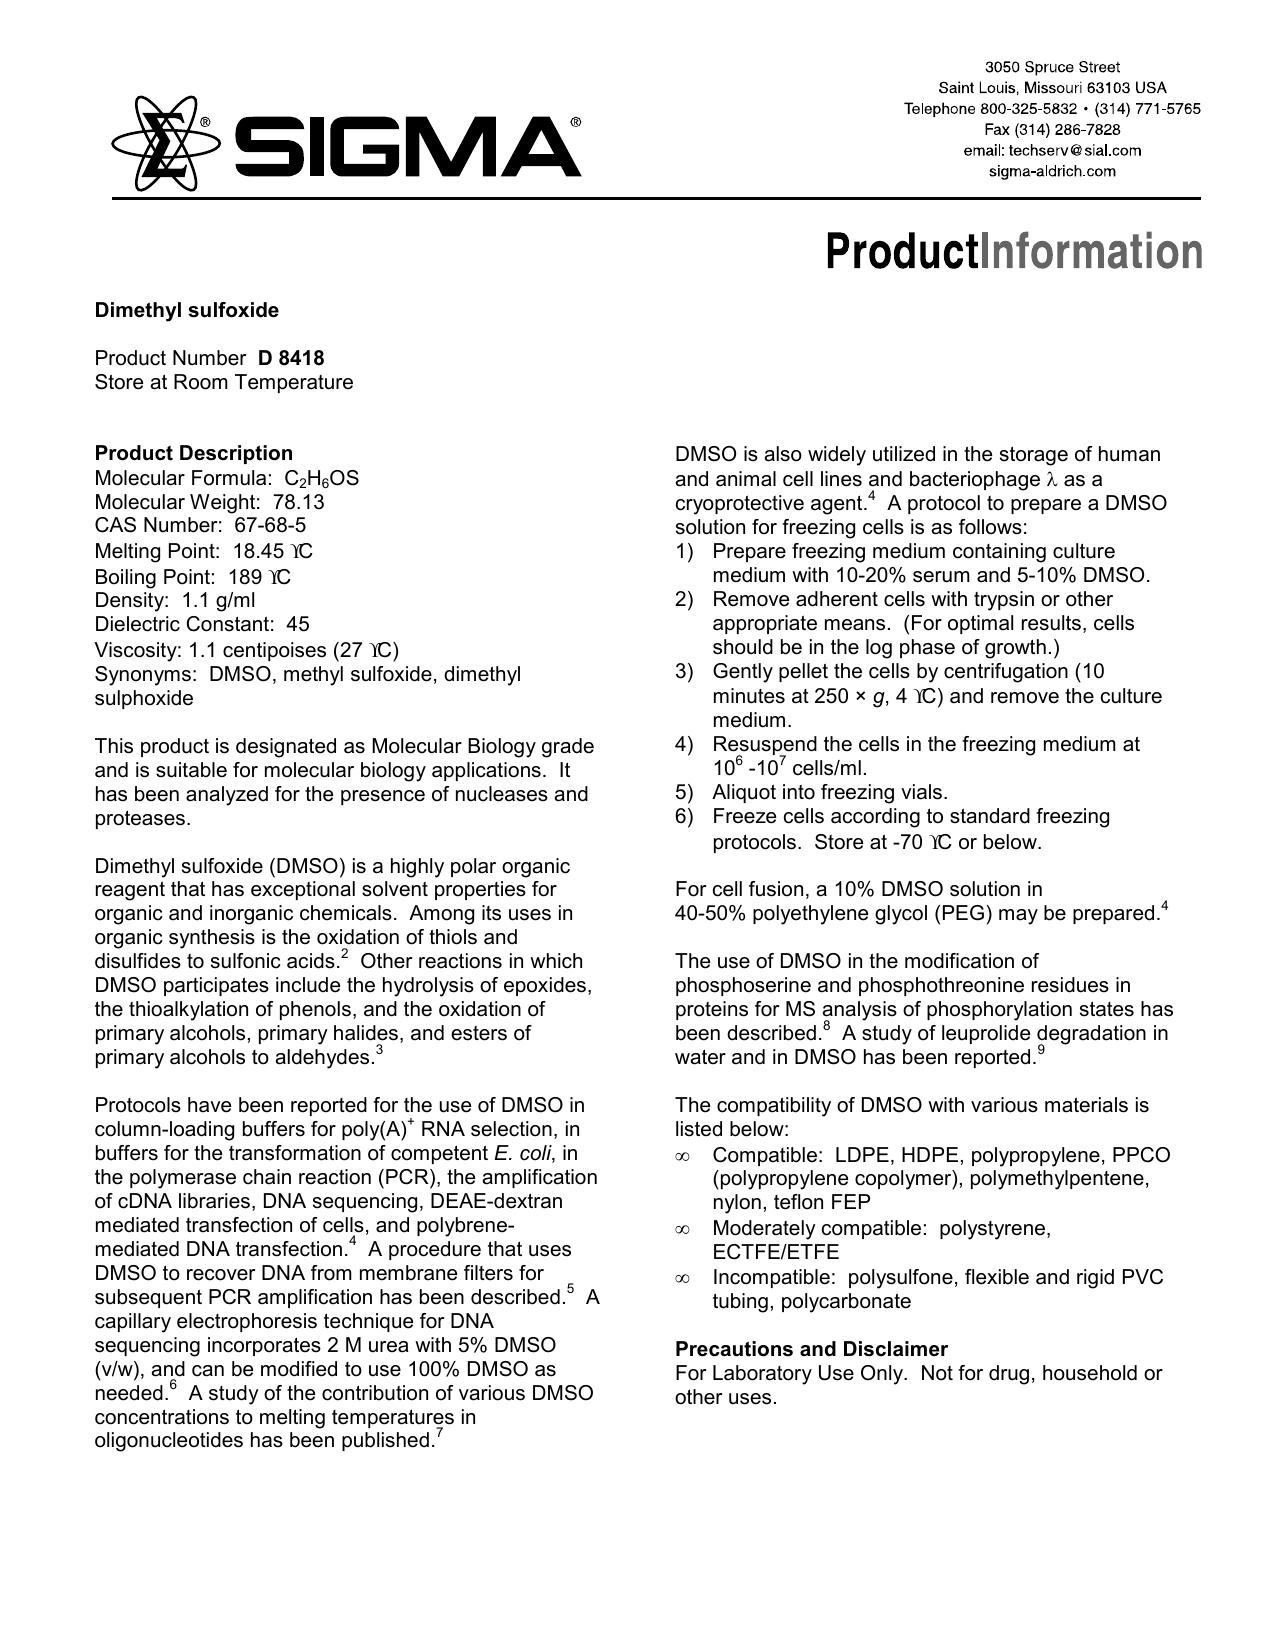 Dimethyl sulfoxide (D8418) - Product Information - Sigma